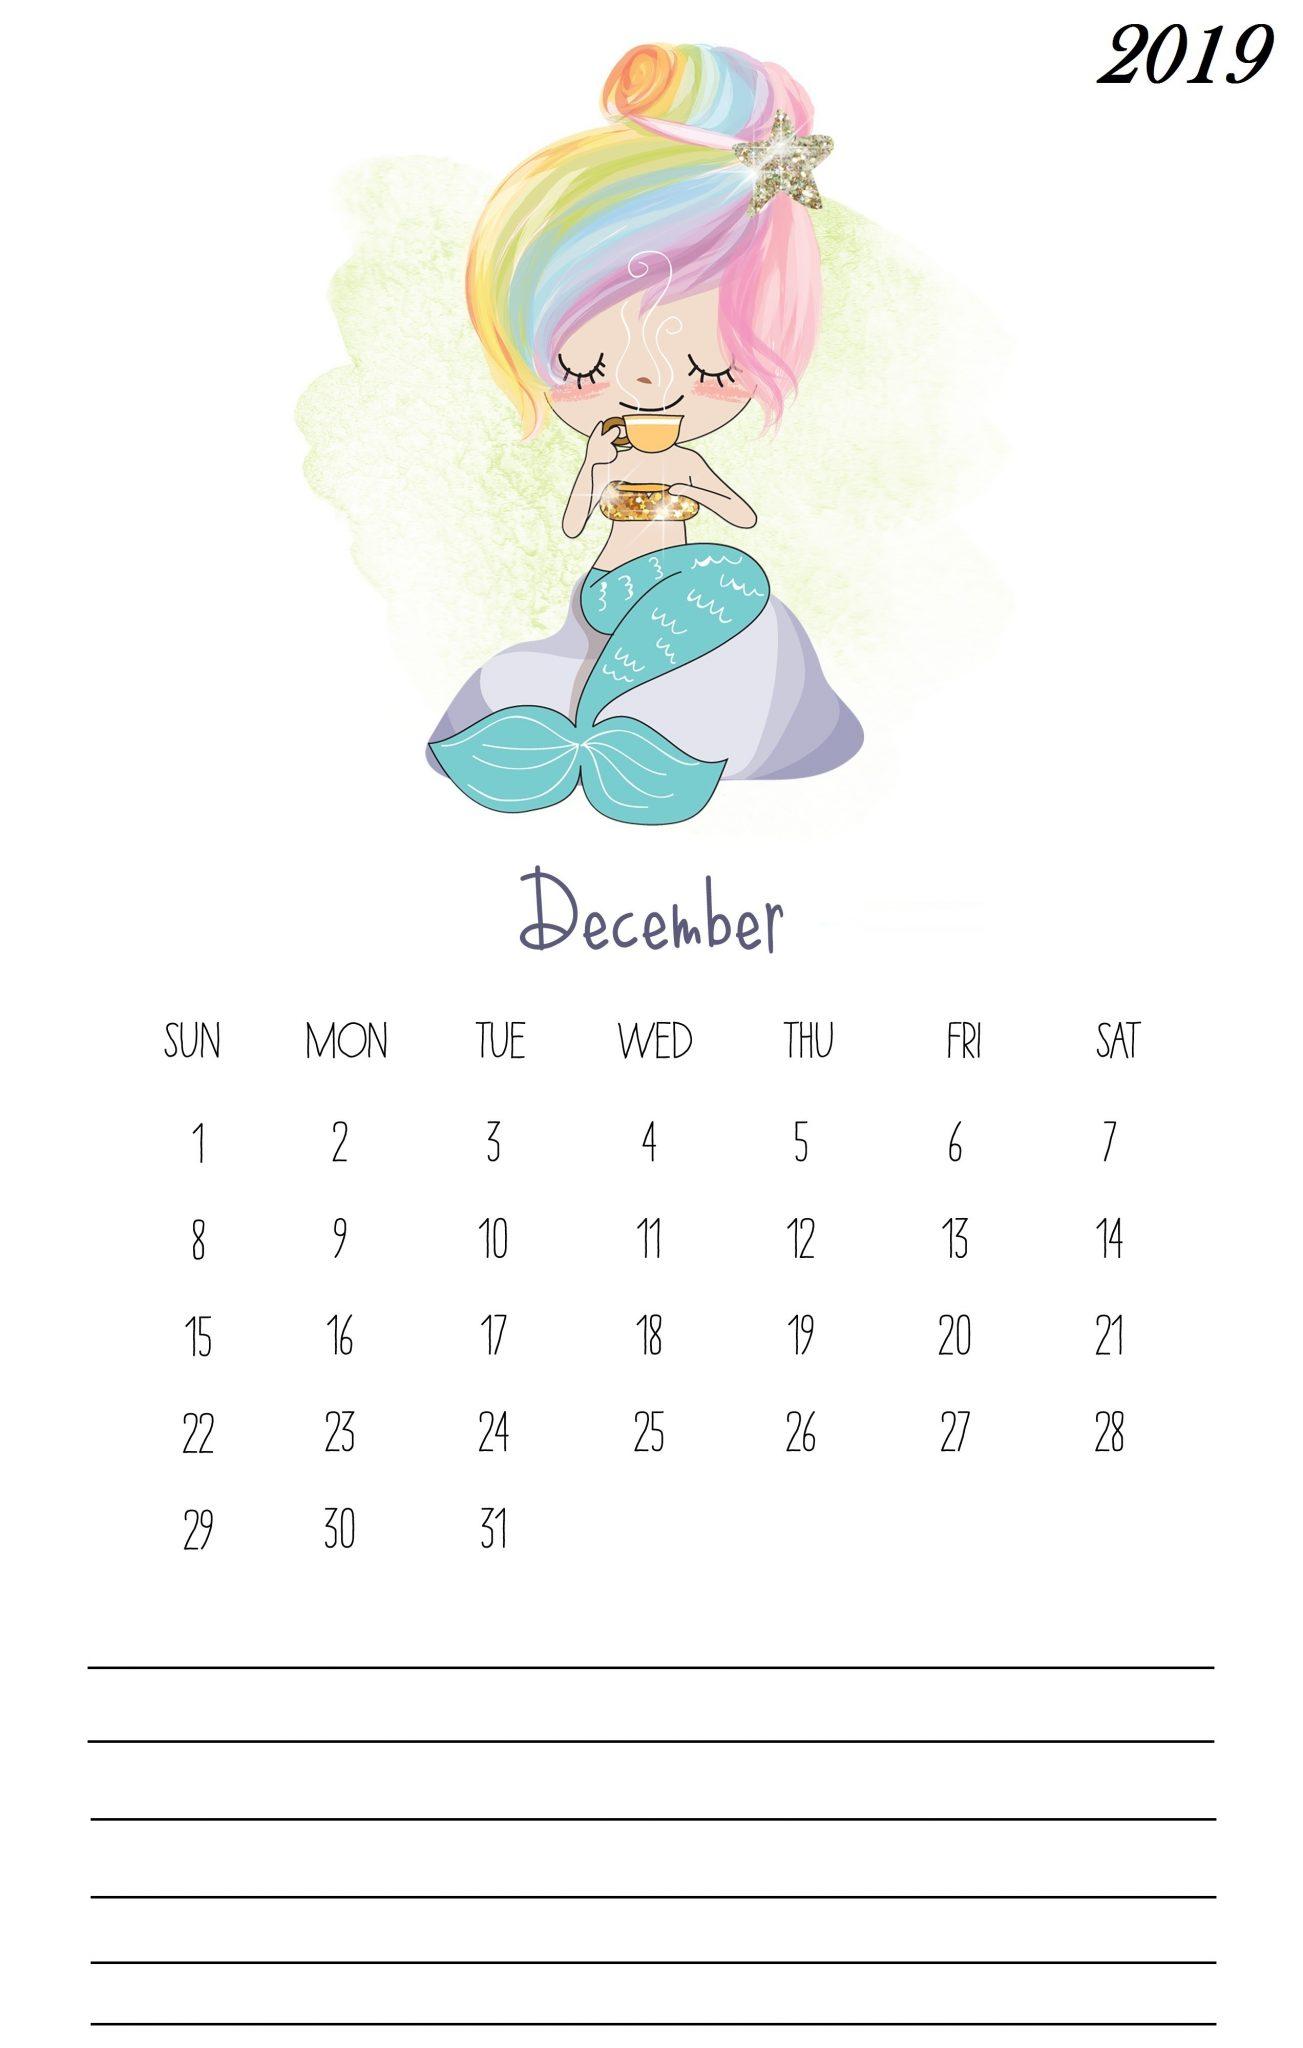 December 2019 Cute Calendar Template